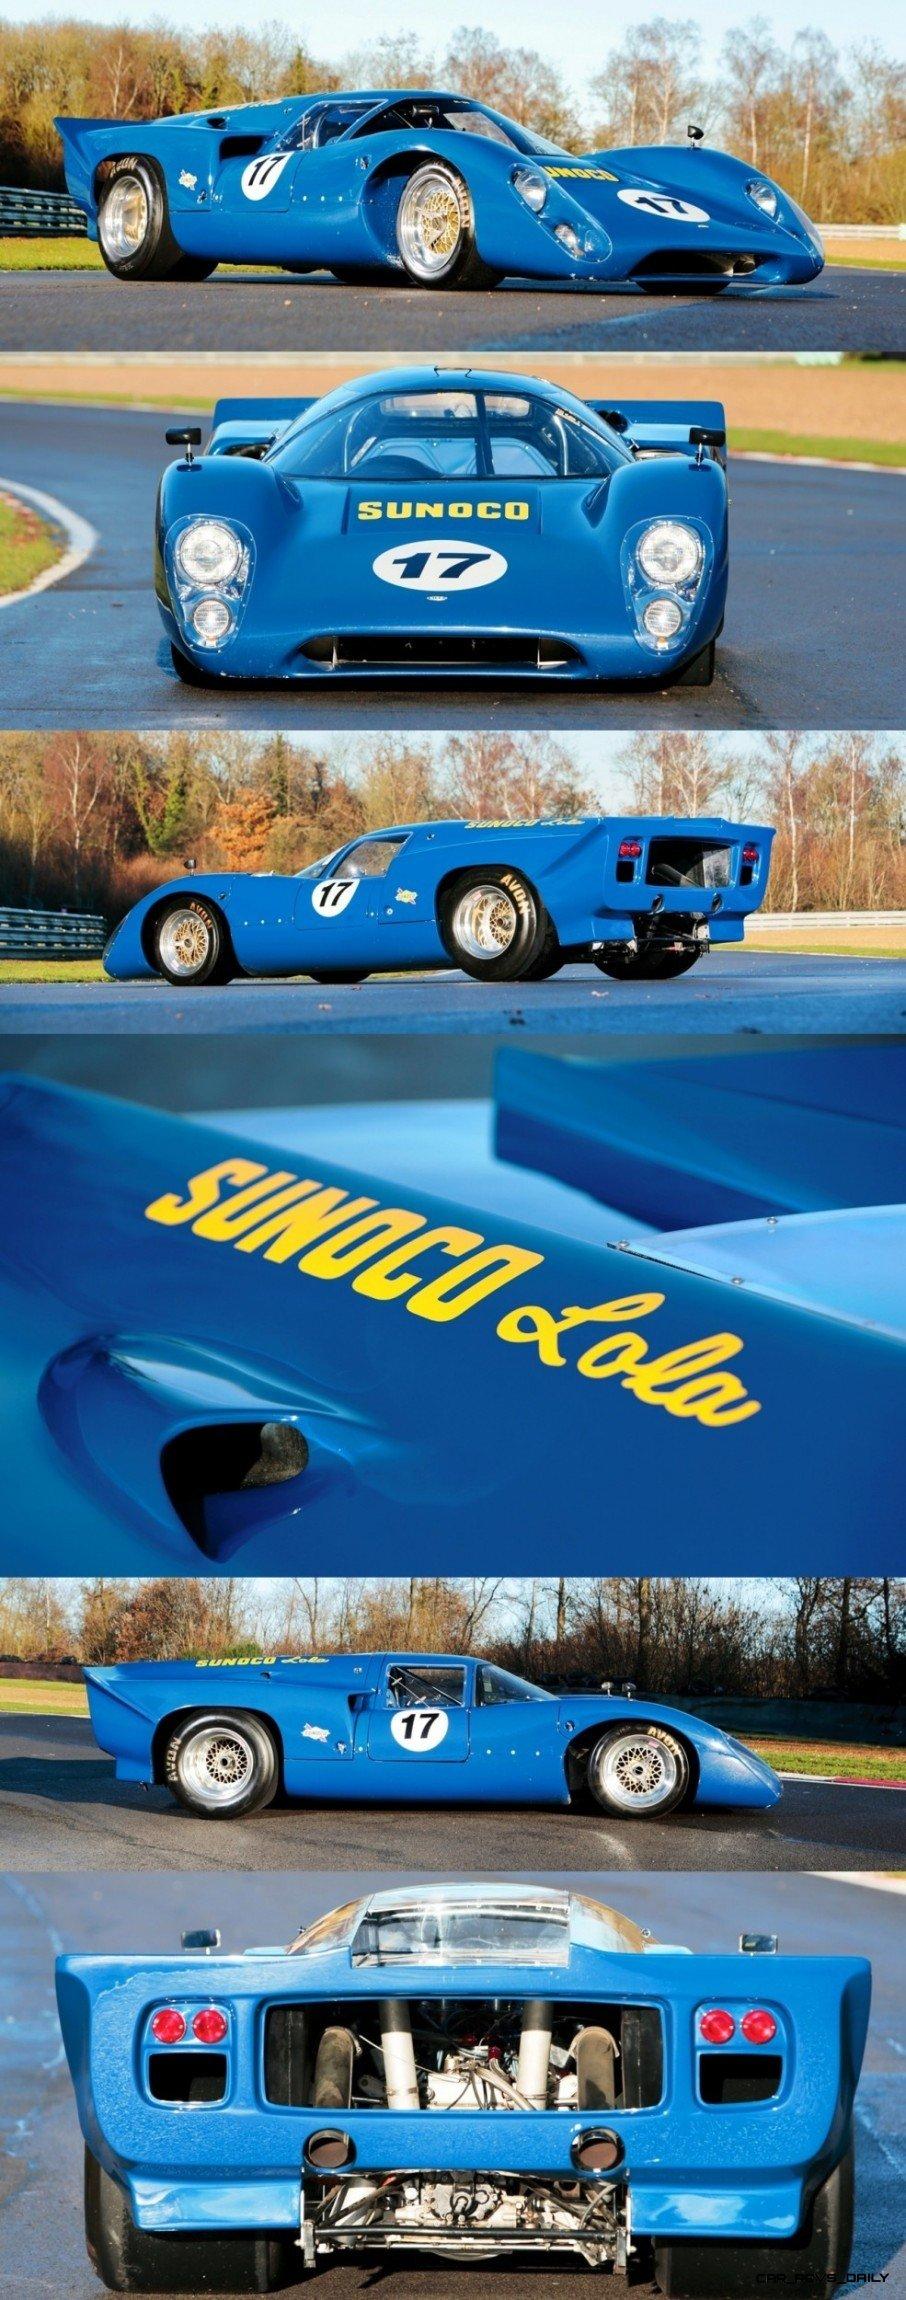 RM Auctions - Paris 2014 Previews - 1969 Lola T70 Mk IIIb by Sbarro2-vert